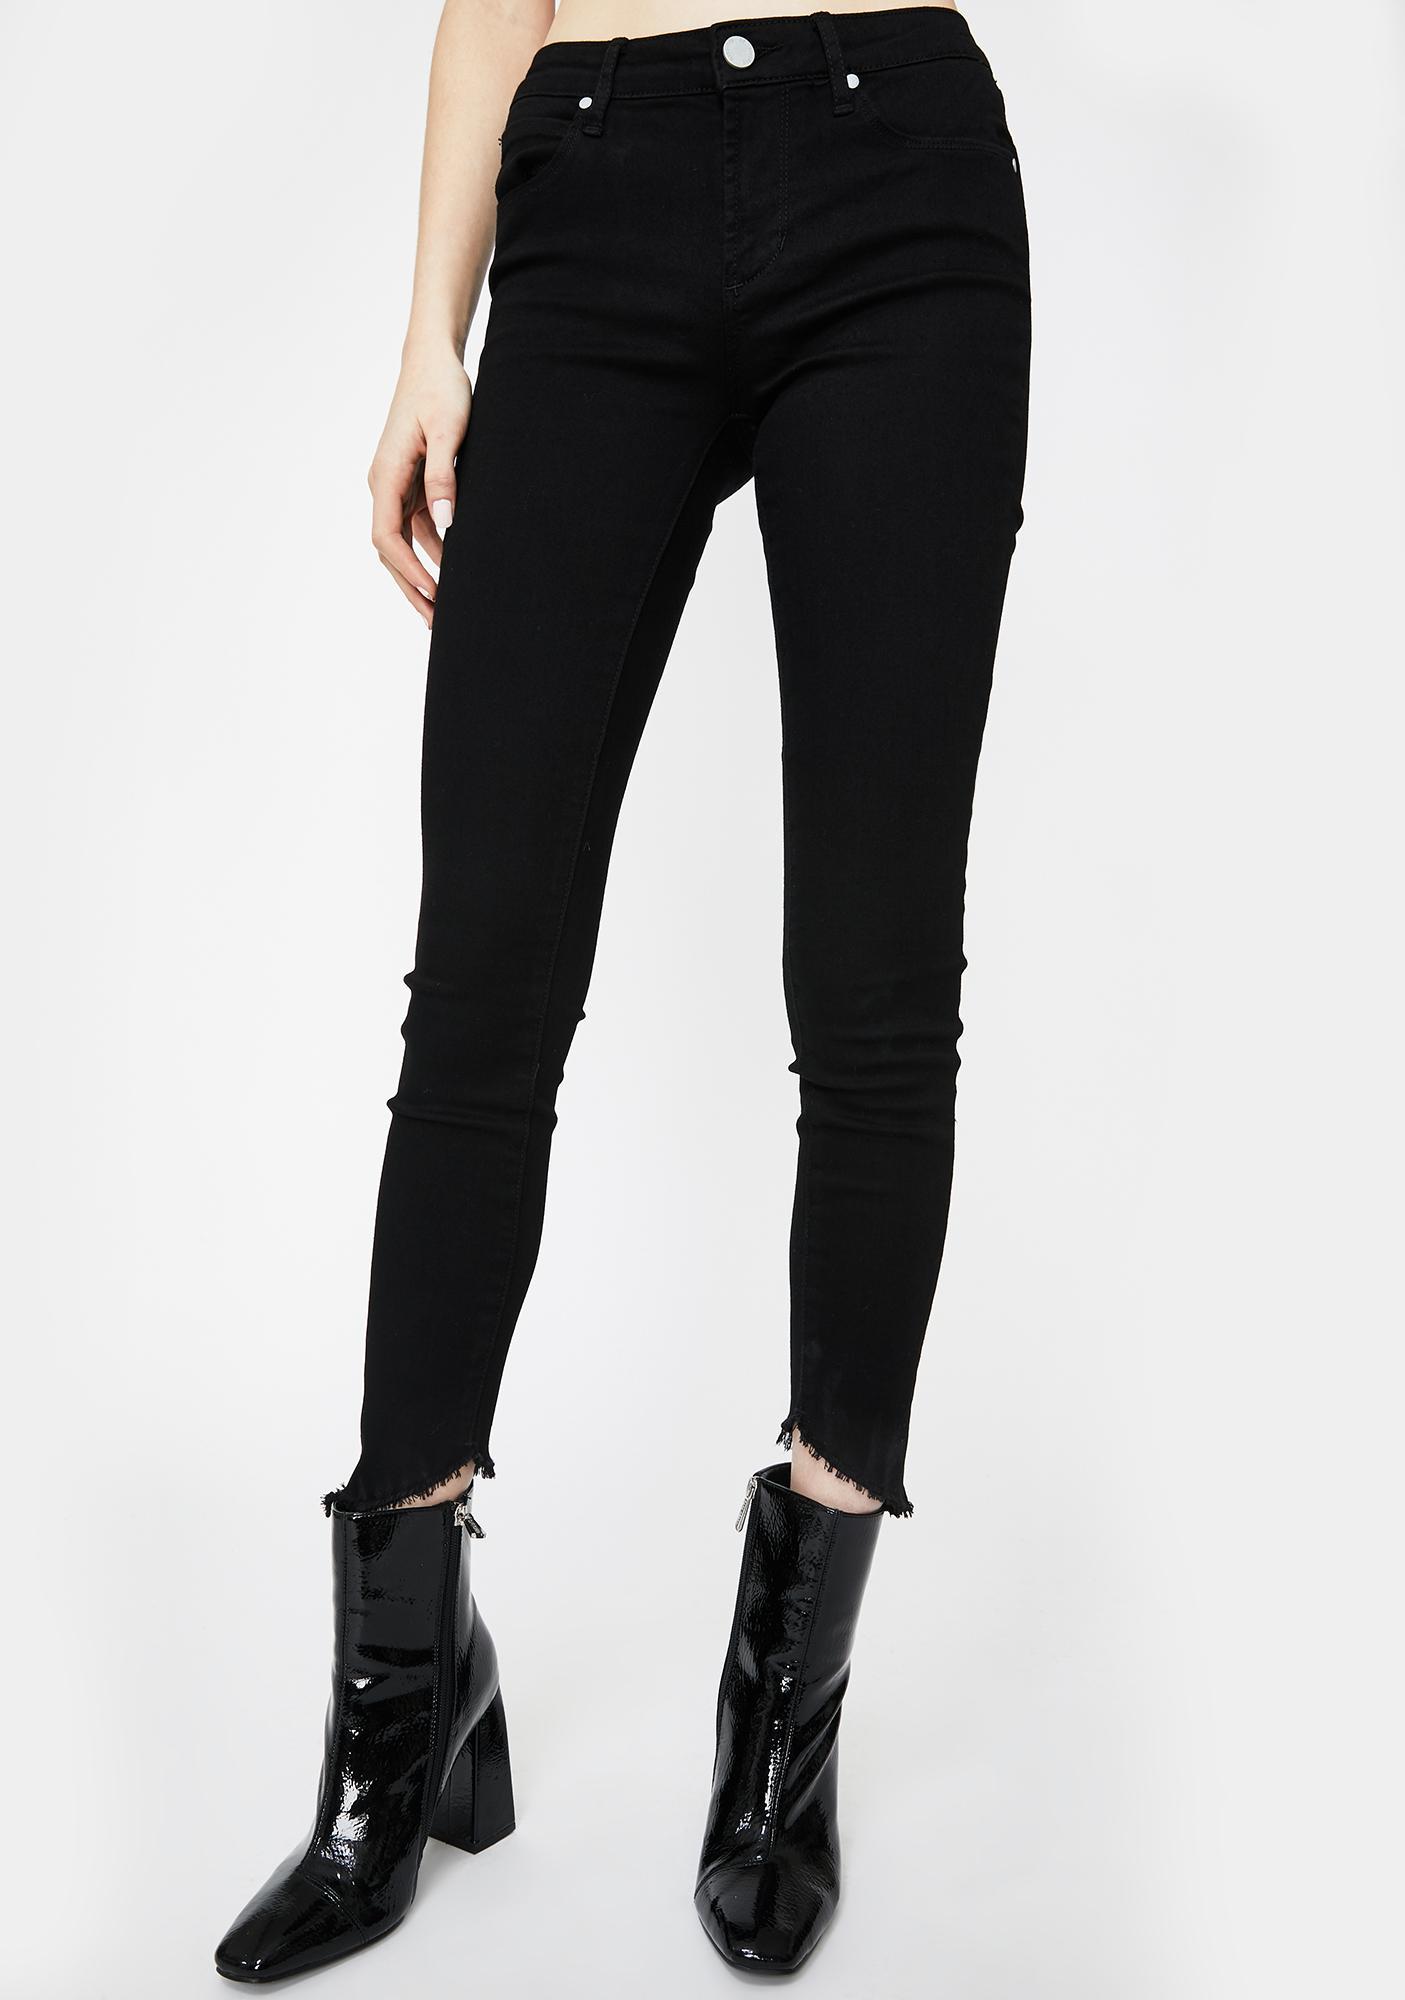 Articles of Society Jet Suzy Skinny Jeans